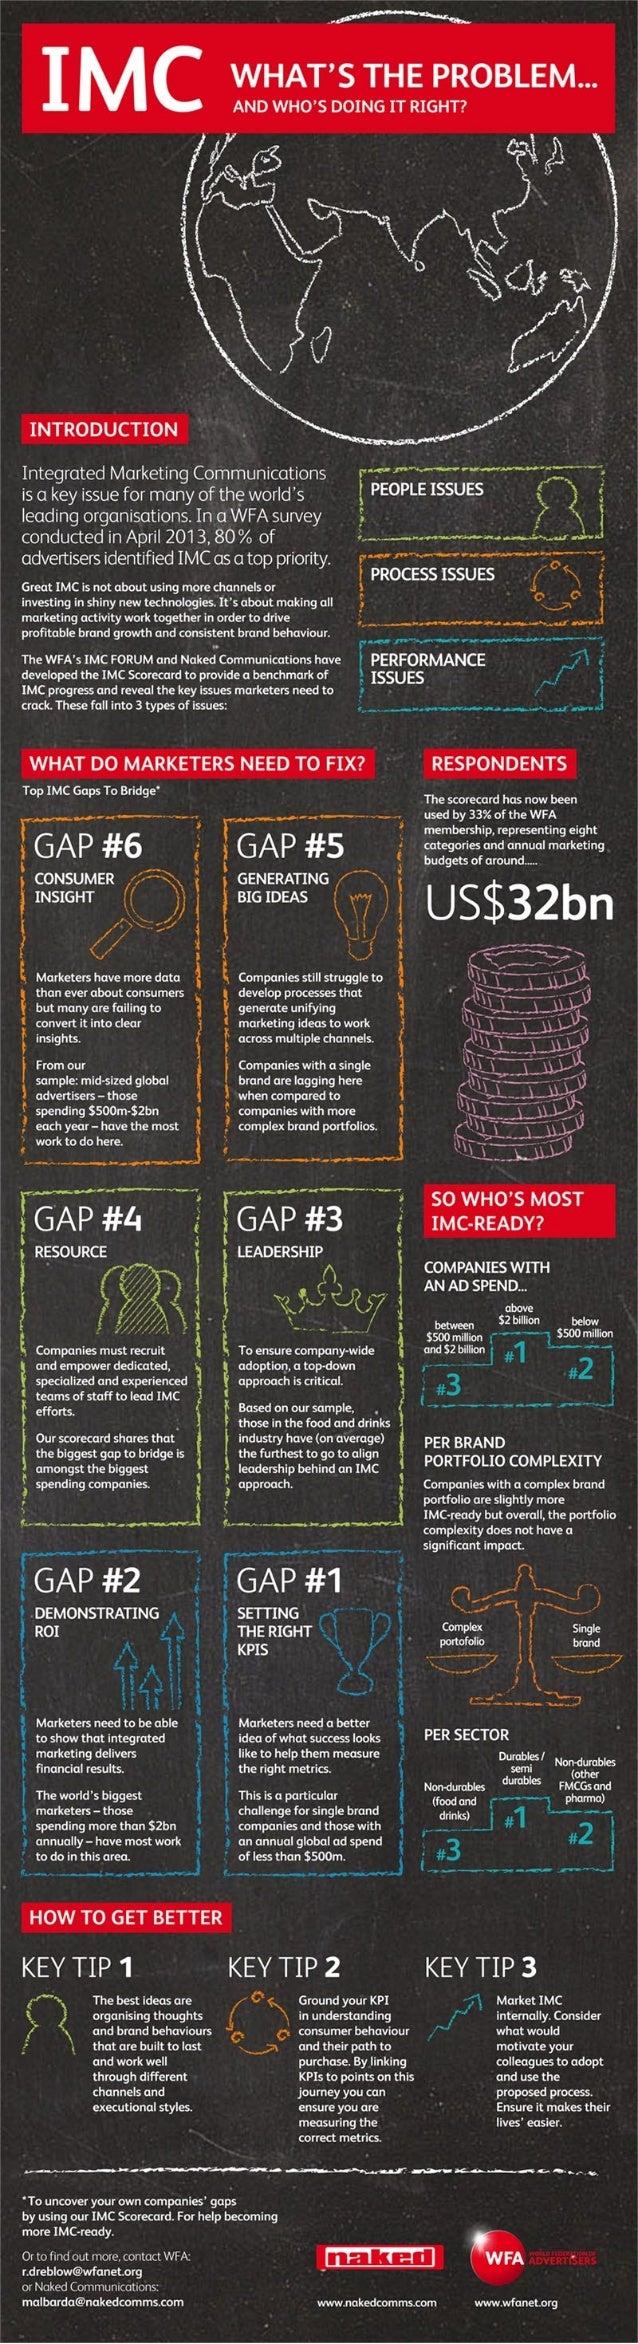 Integrated Marketing Communications (IMC) infographic